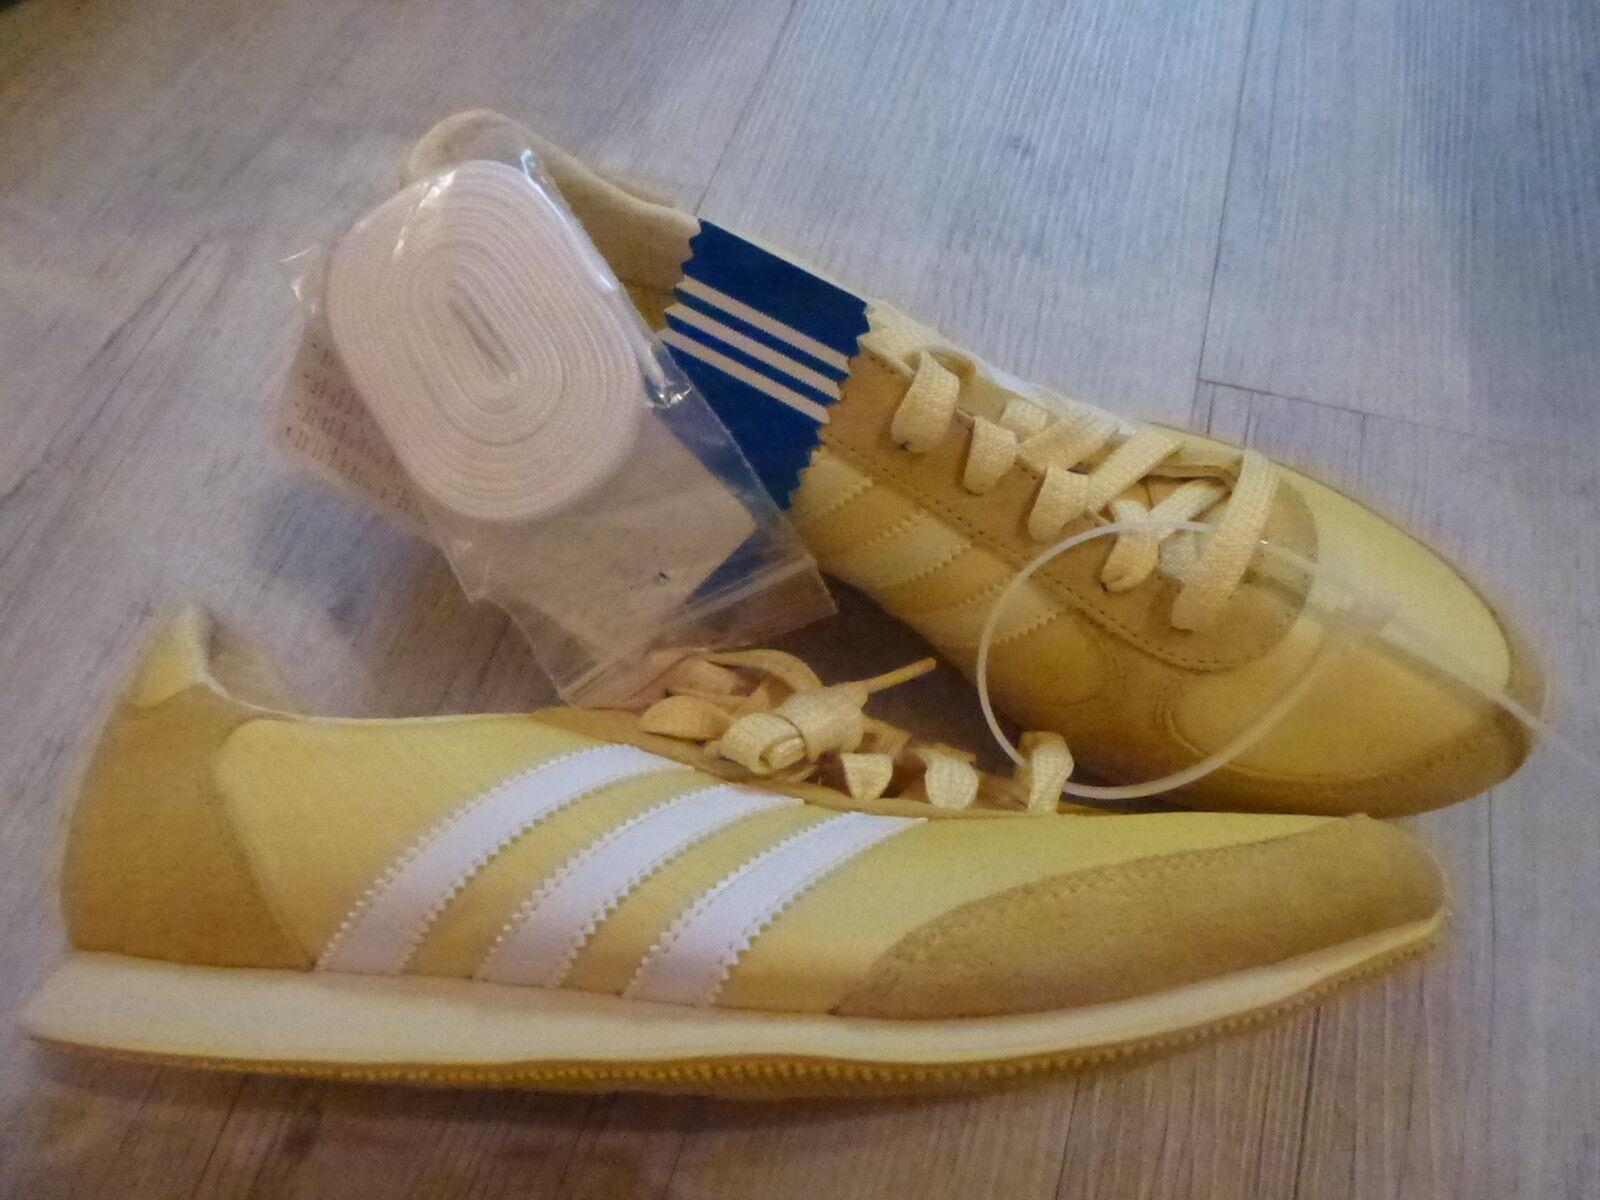 Original adidas Turnschuhe Running G44392 in gelb - N E U  | Qualität Produkt